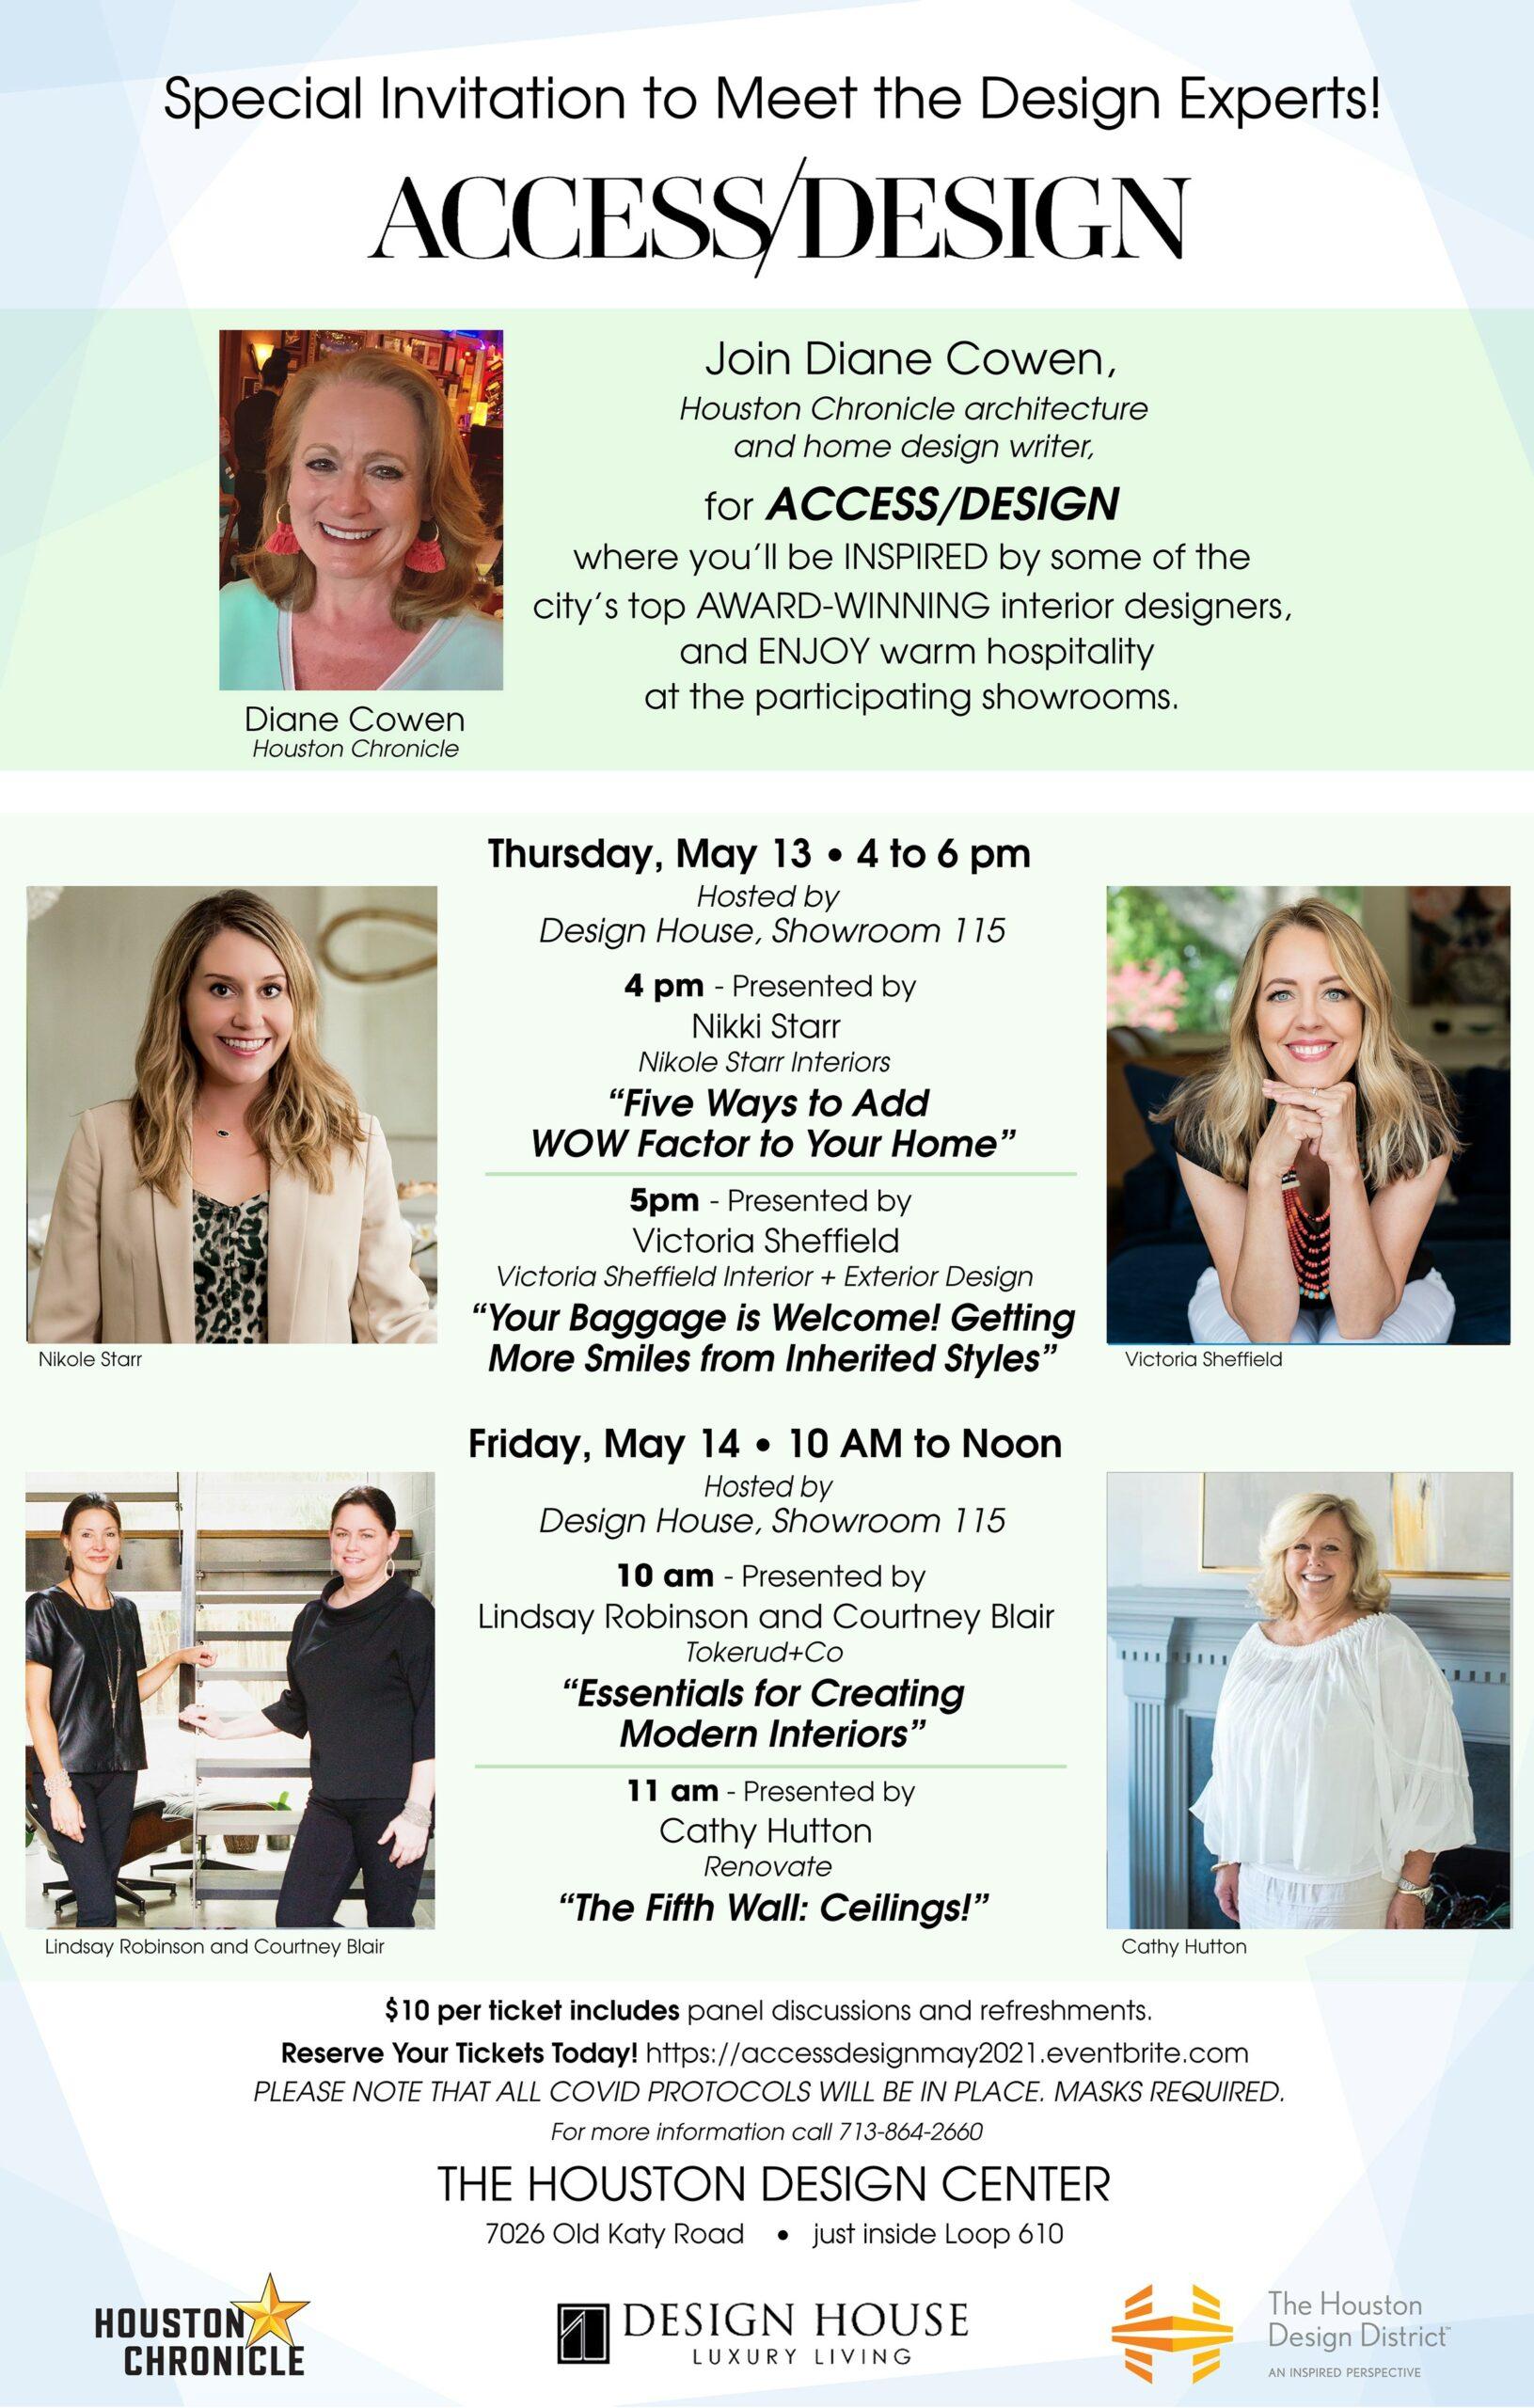 Access/Design: May 13-14, 2021